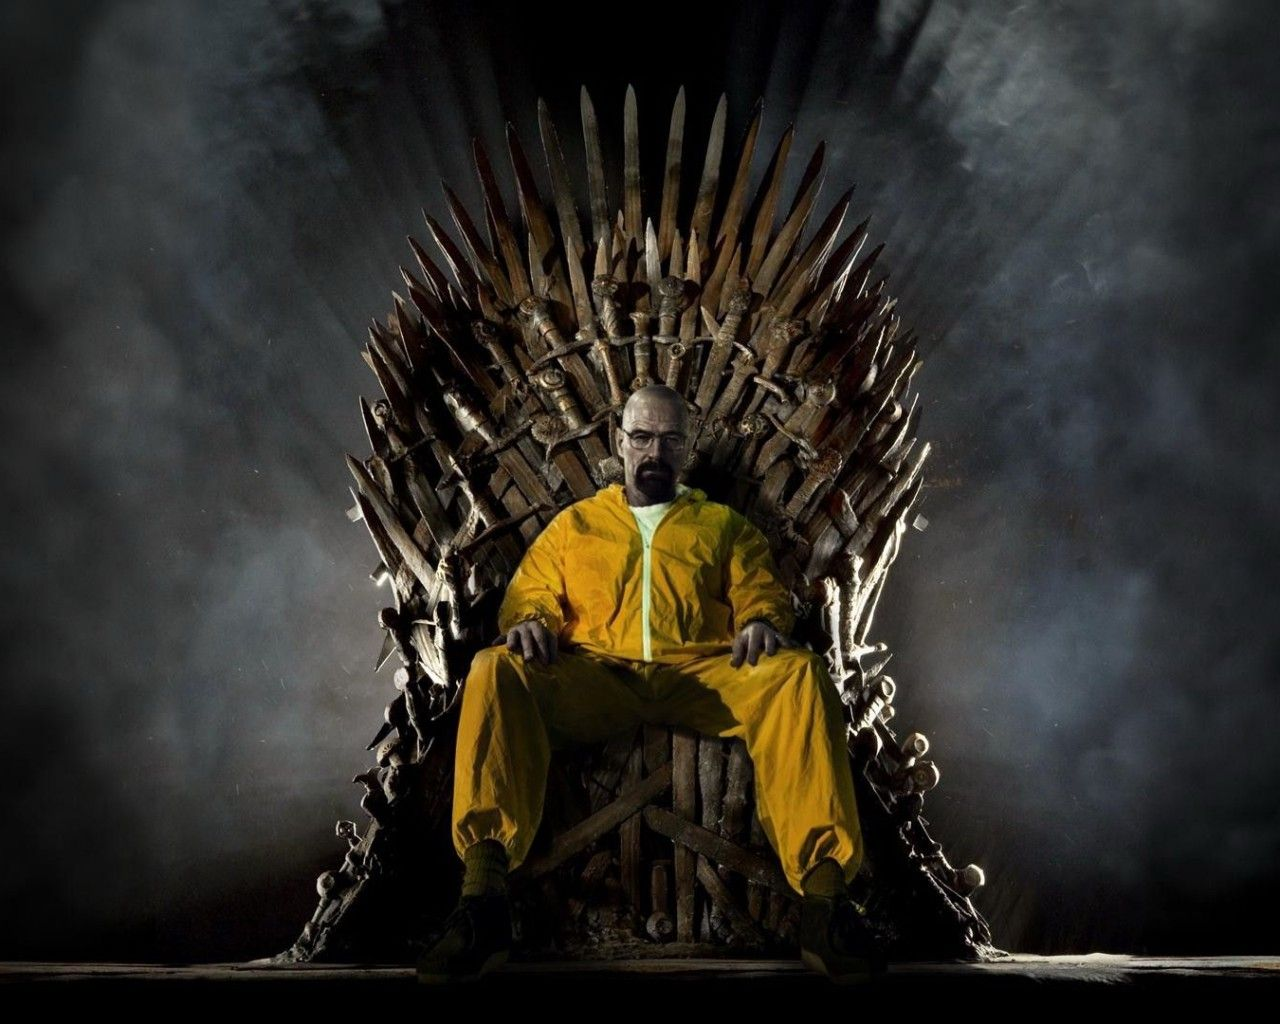 Heisenberg On The Iron Throne Breaking Bad Bitch In